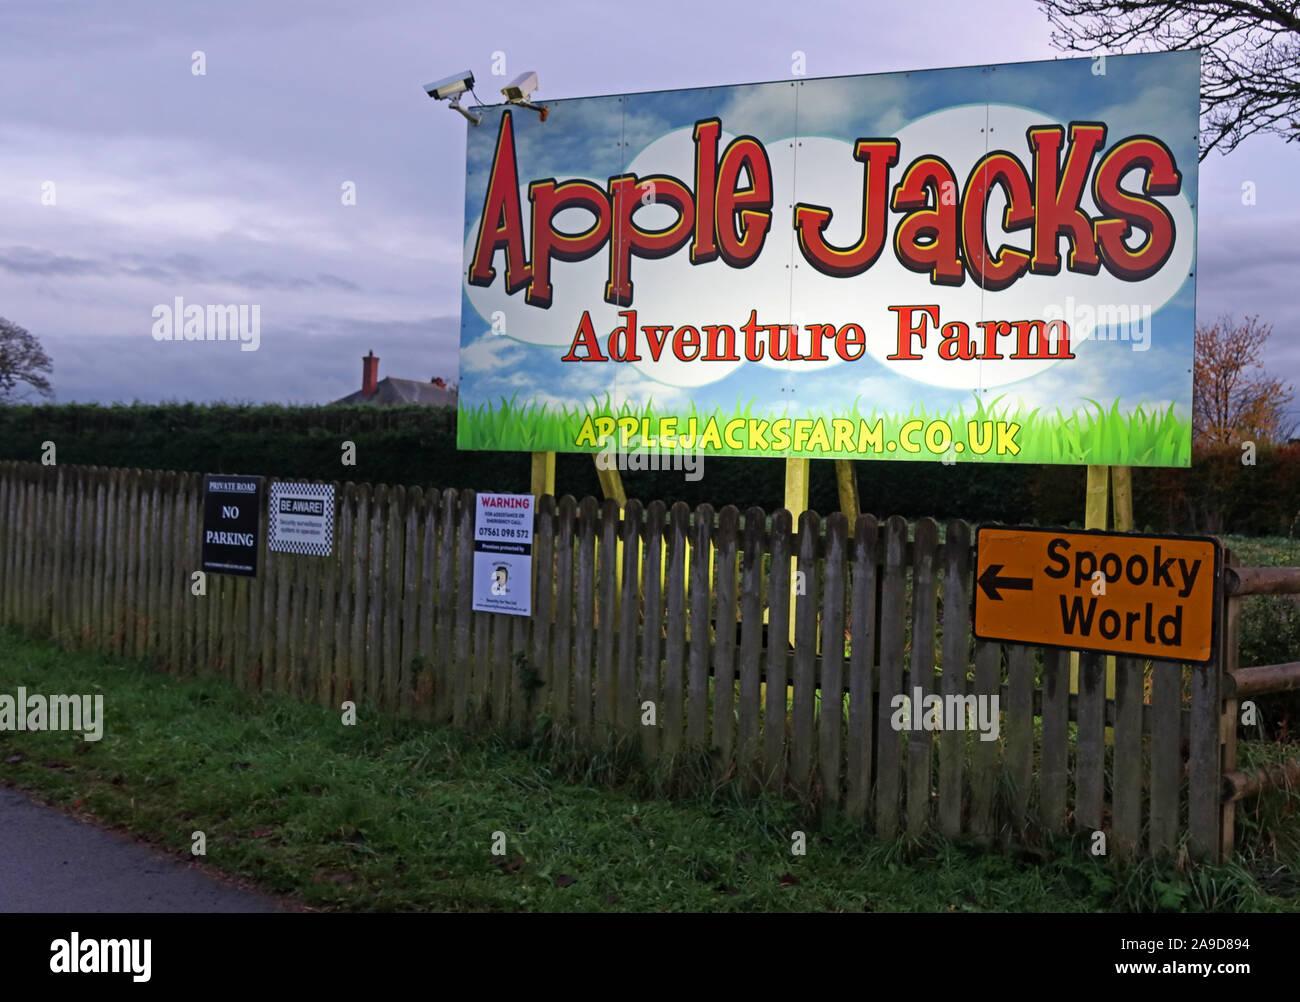 @HotpixUK,HotpixUK,GoTonySmith,Blue Hour,Village,night,nighttime,night time,England,UK,North West England,WA4 4NW,farmers,diversifying,NFU,Adventure Farm,Spooky World Apple Jacks Farm,Tourist Attraction,Stretton Road,sign,kids day out,Apple Jacks Adventure Farm,The More the Merrier,tickets,play areas,heating,Jacks ball blast,Farm Fun Ltd,Apple Jacks Adventure Farm sign,maze,mazes,Cheshire Tourist Attractions